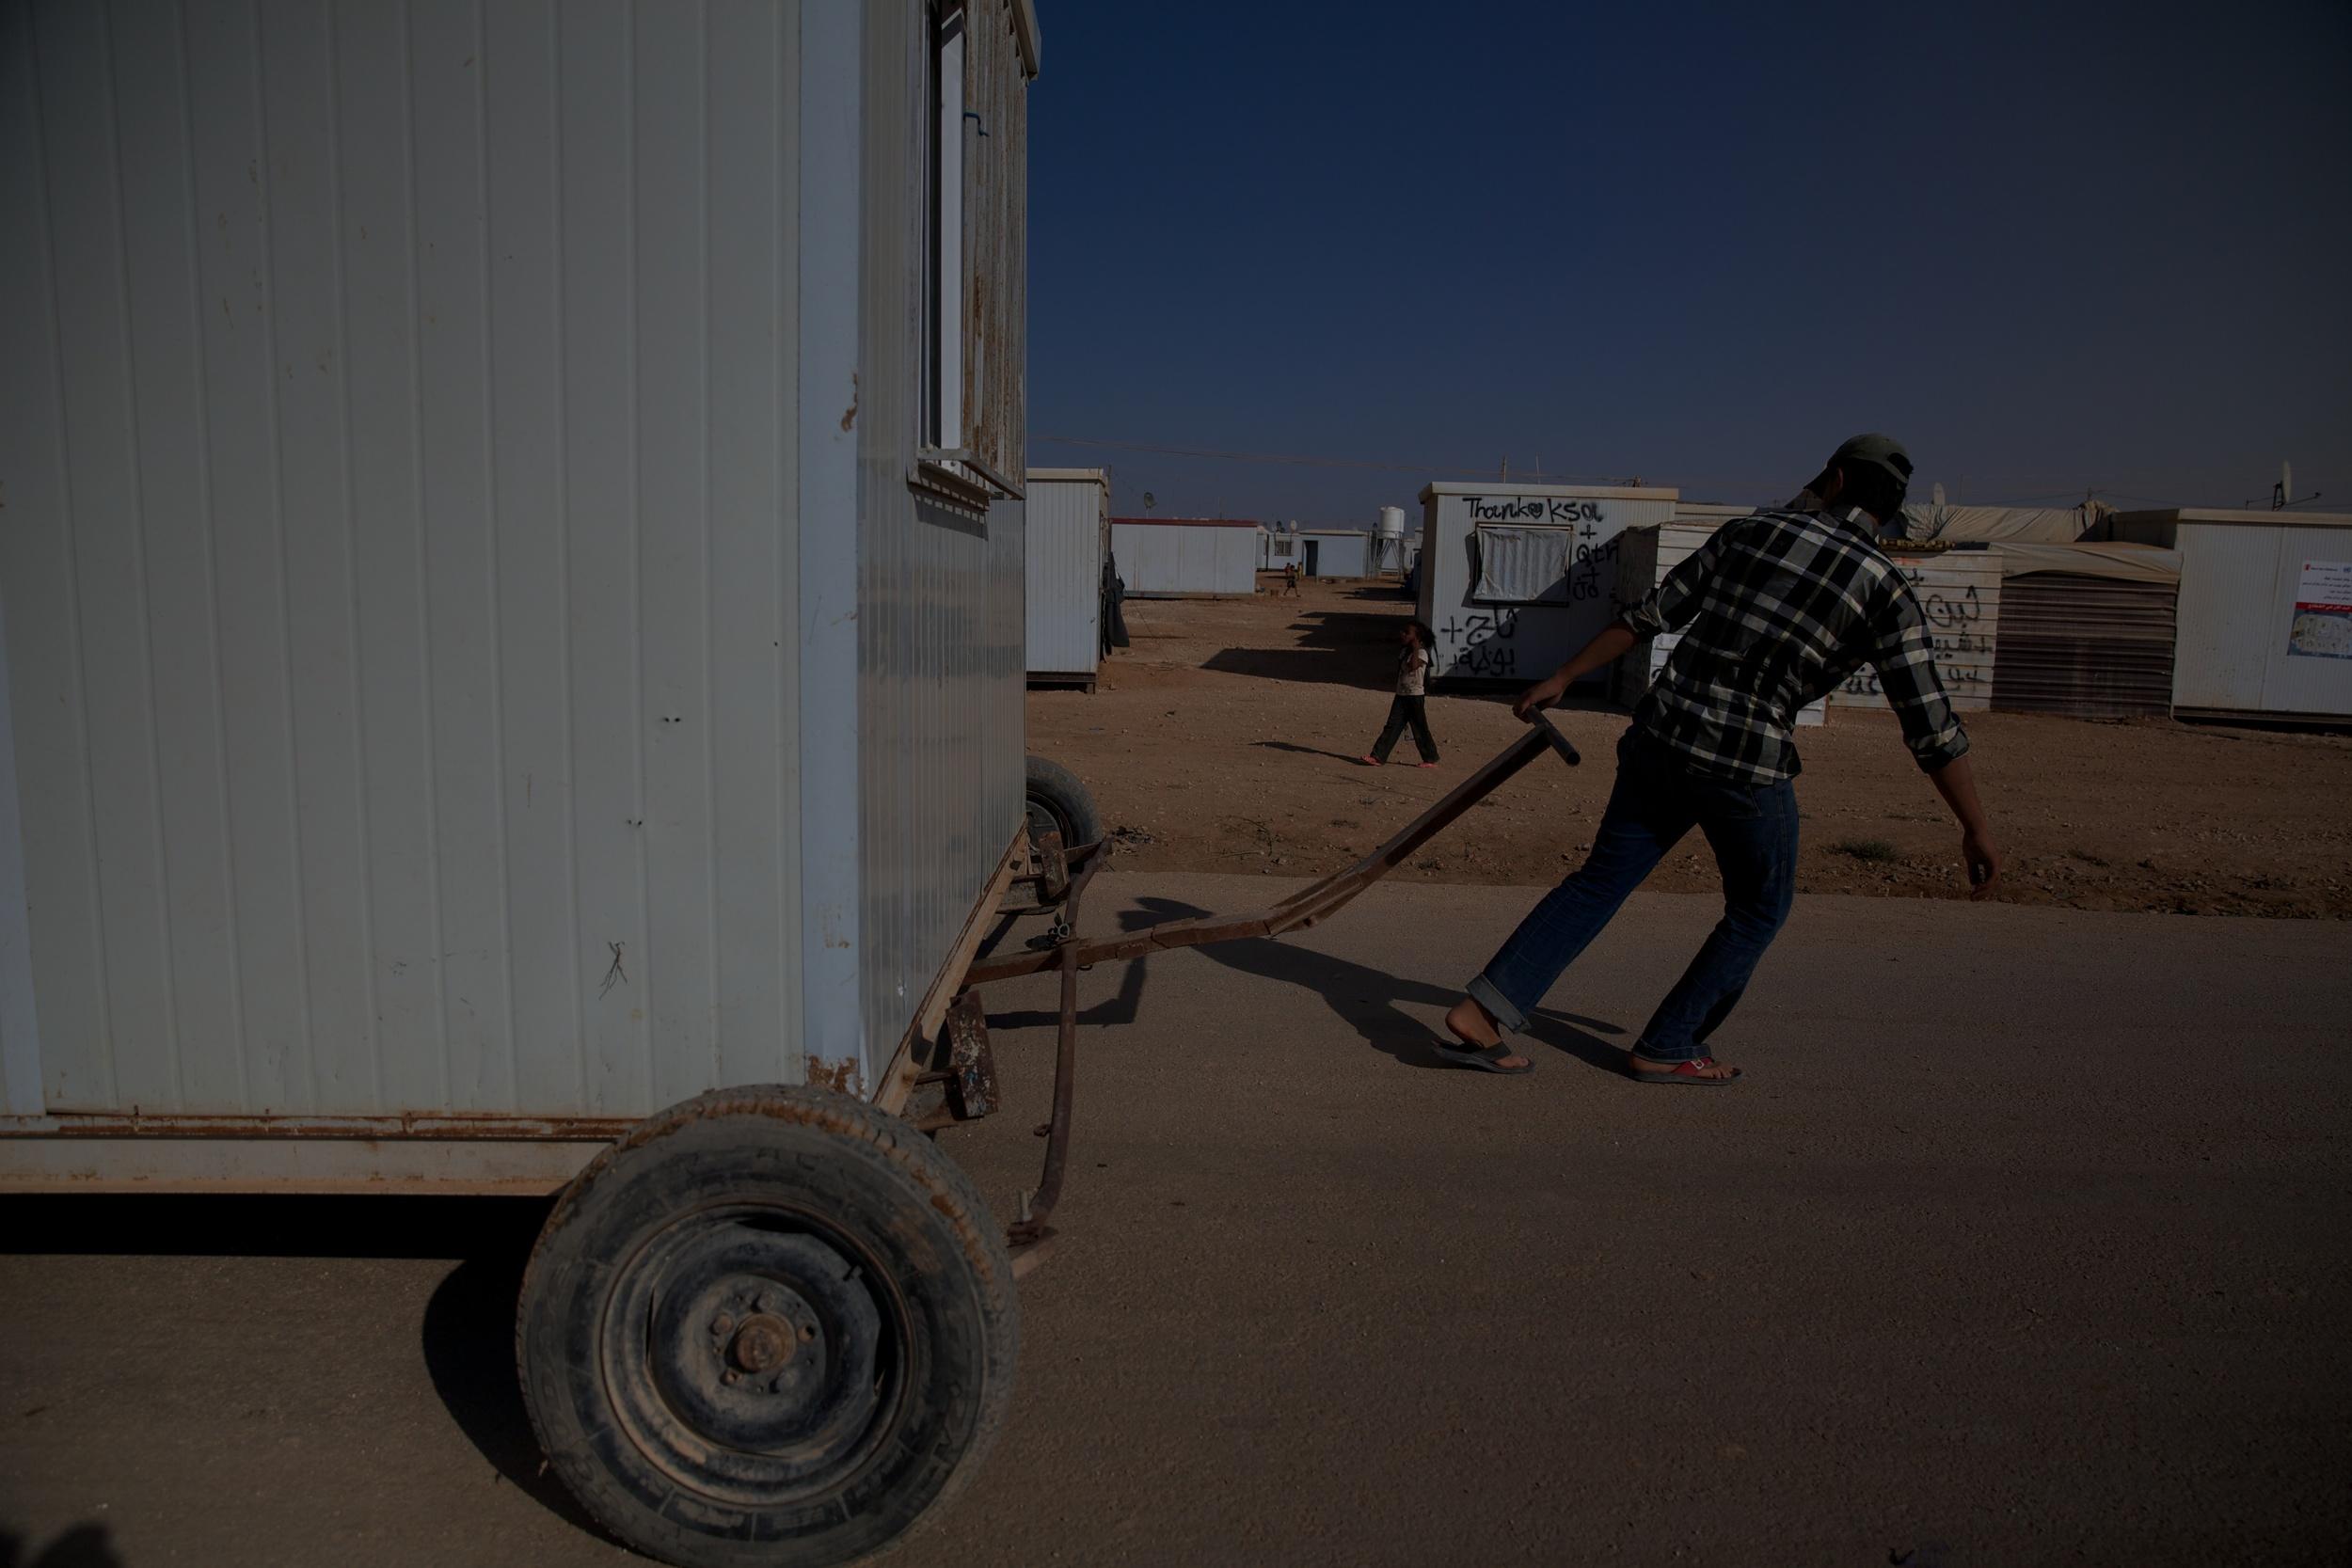 Syrian refugees move a house through the Zaatari refugee camp in Jordan.